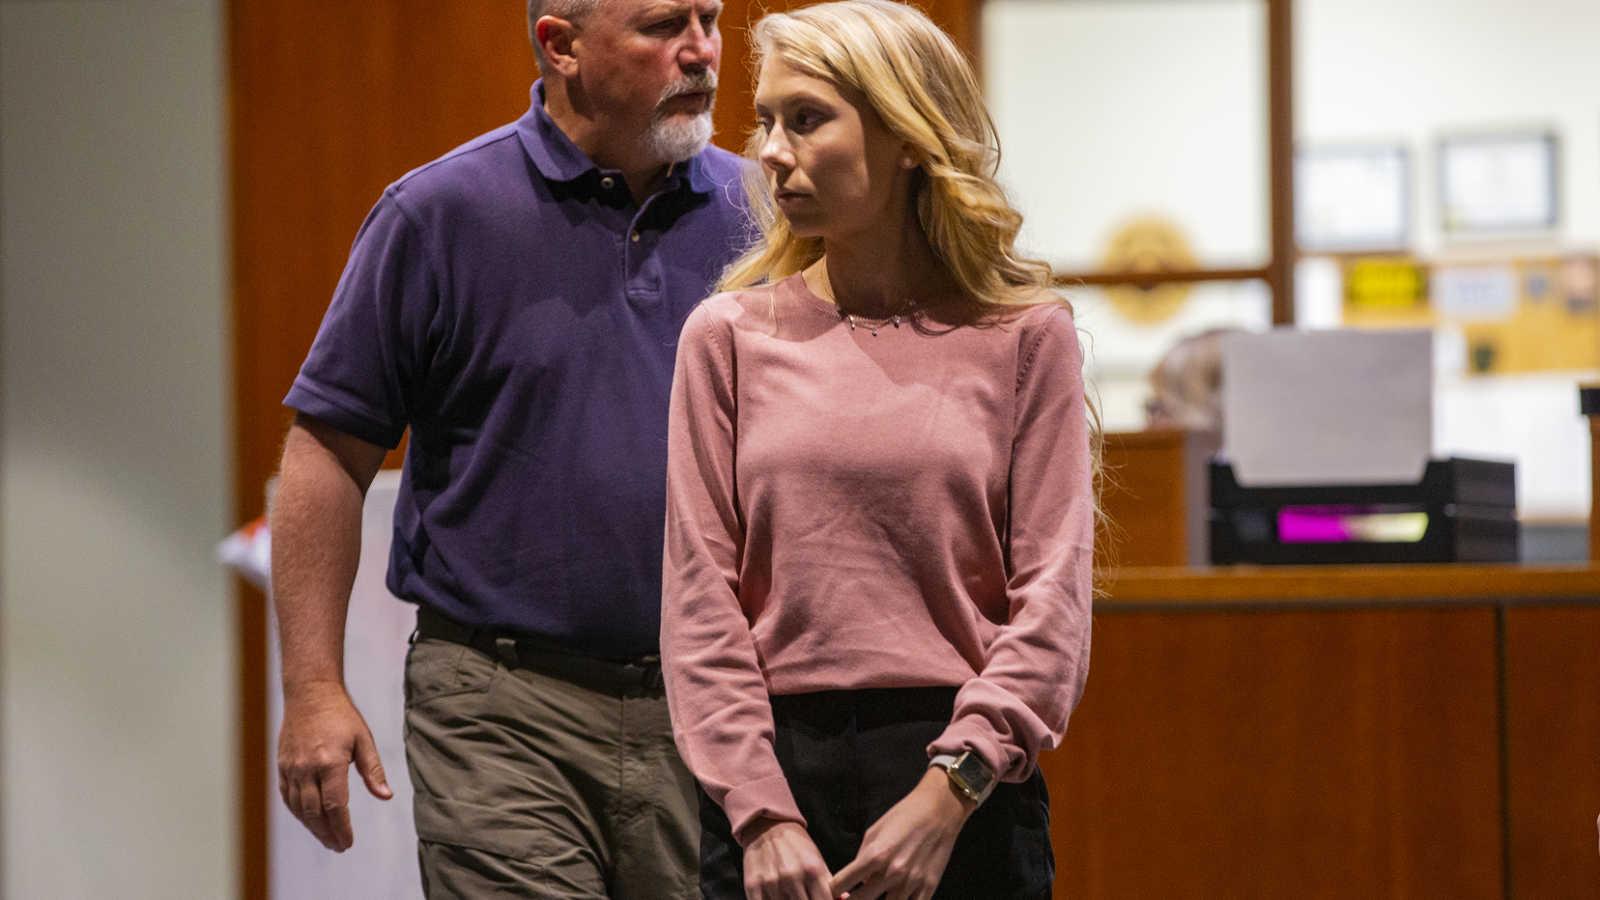 SEE OHIO CHEERLEADER INTERROGATION: Brooke Skylar Richardson sobs, confesses to burying newborn in yard – CrimeOnline